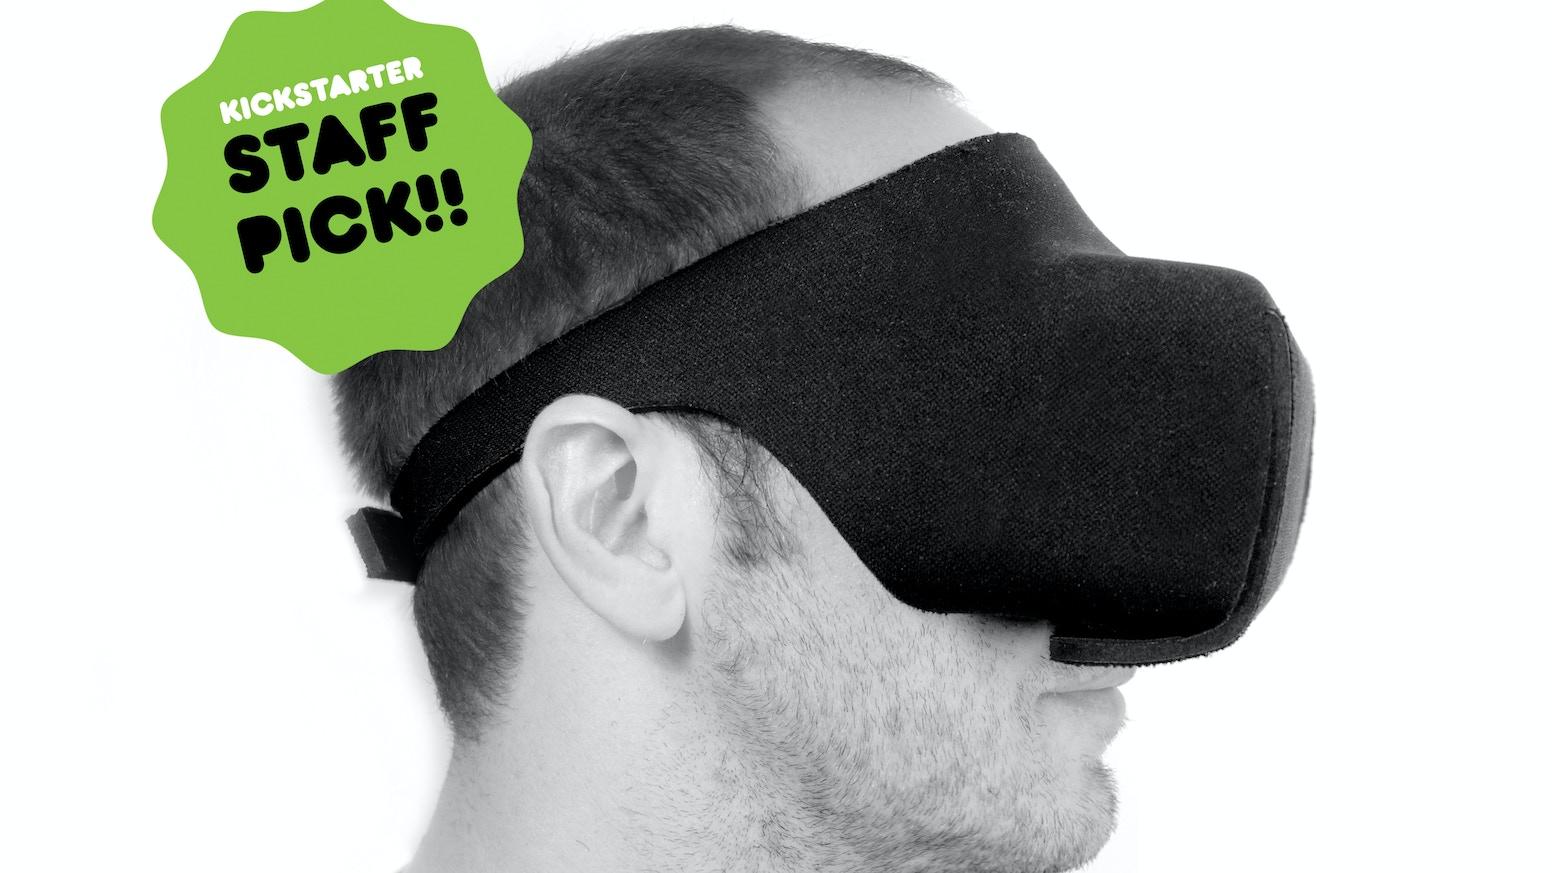 viewbox a vr headset by simon josefsson viewer profile for